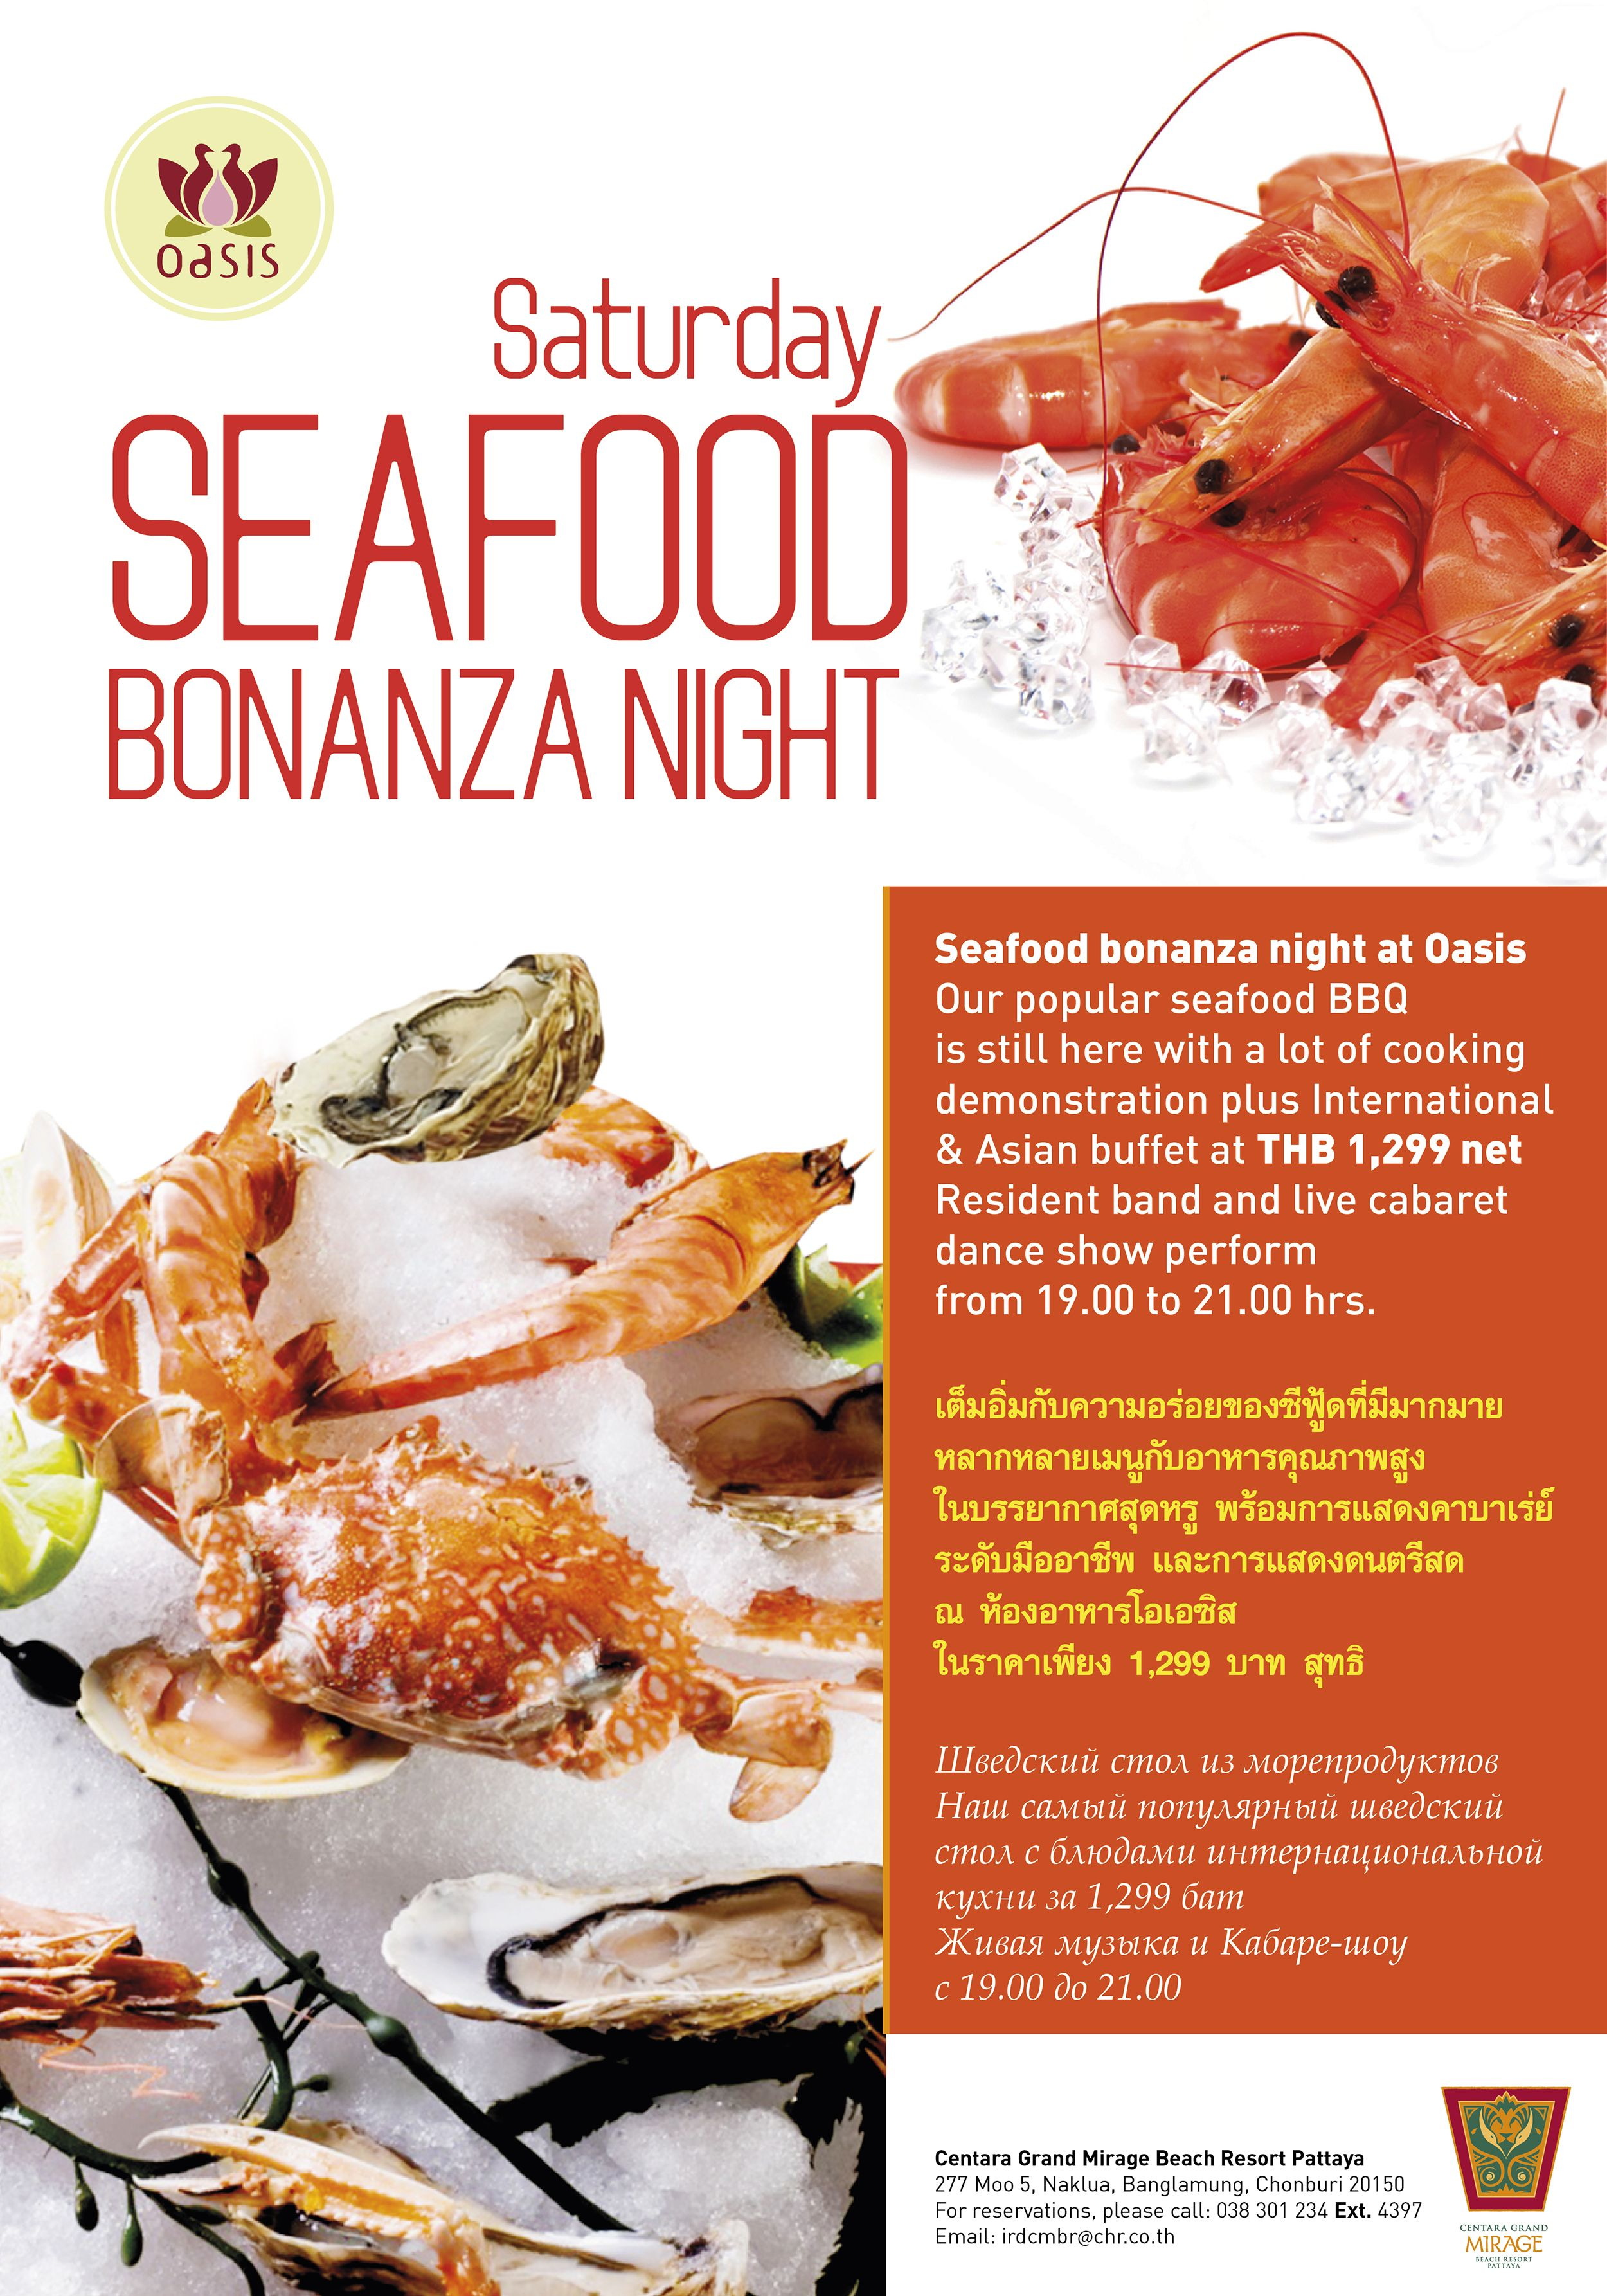 Saay Seafood Bonanza Night Buffet At Oasis Restaurant Centara Grand Mirage Beach Resort Pattaya